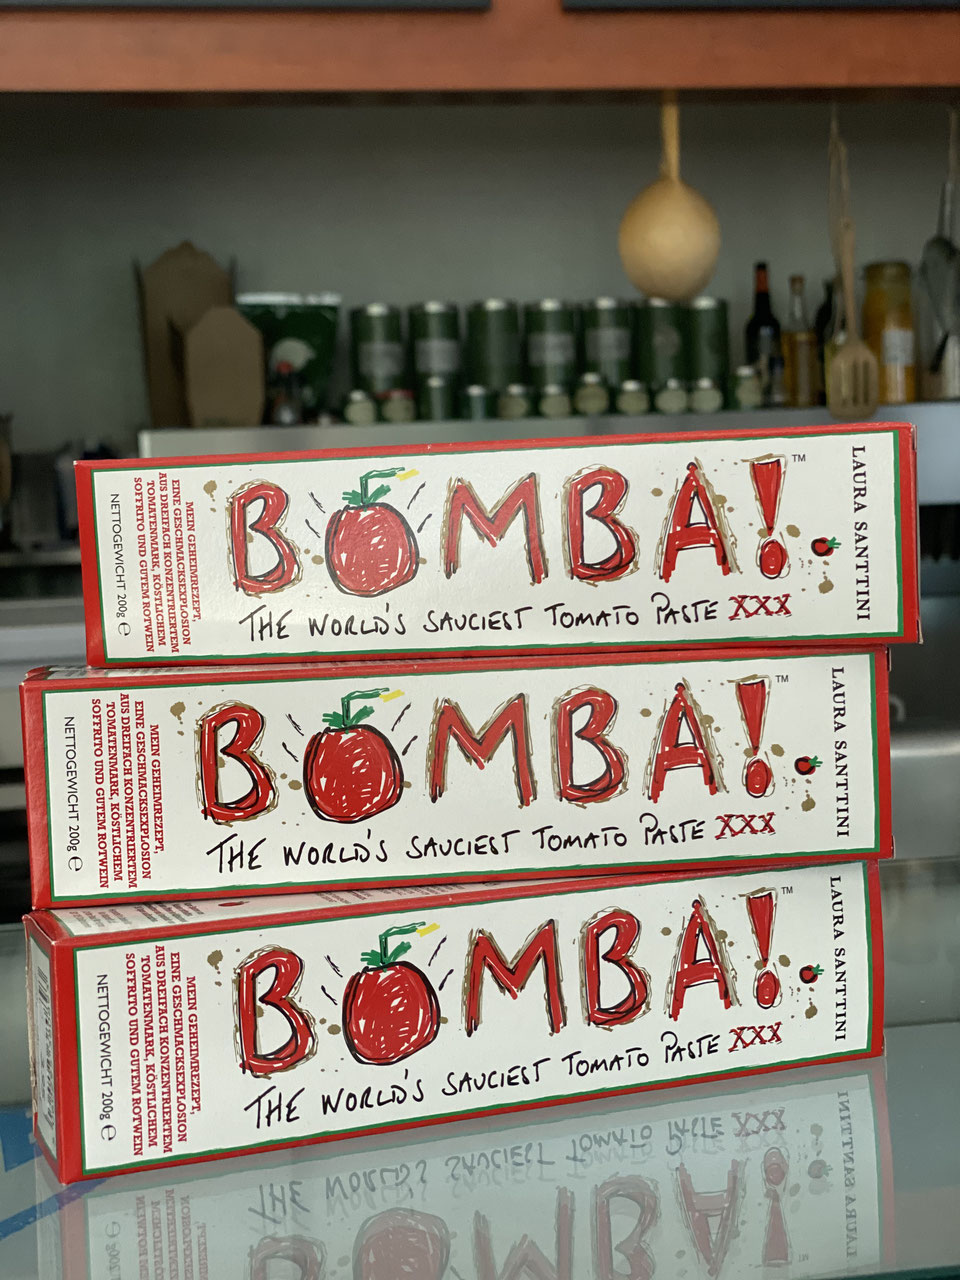 Bomba Tomaten Paste